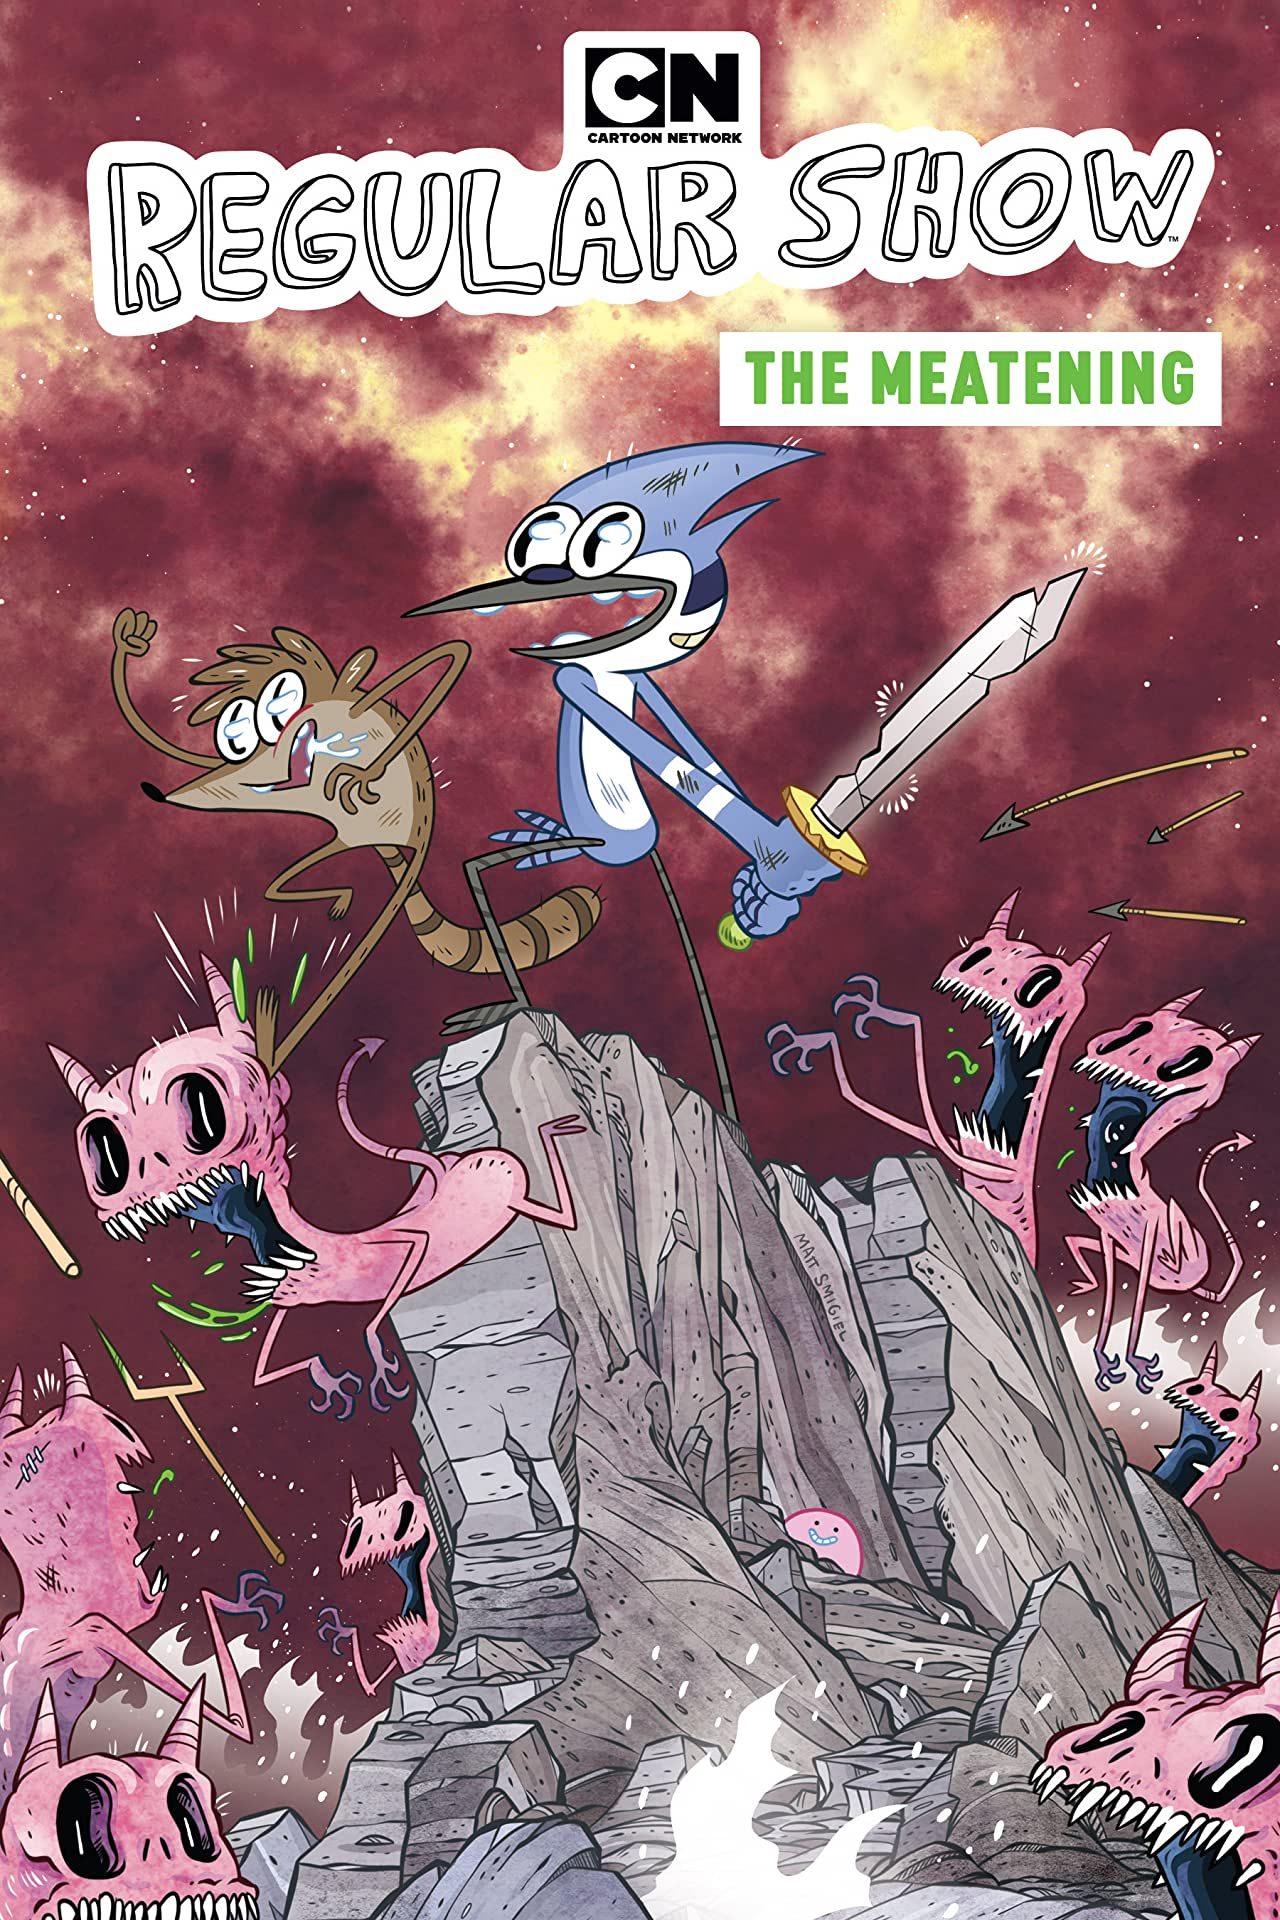 Regular Show: The Meatening